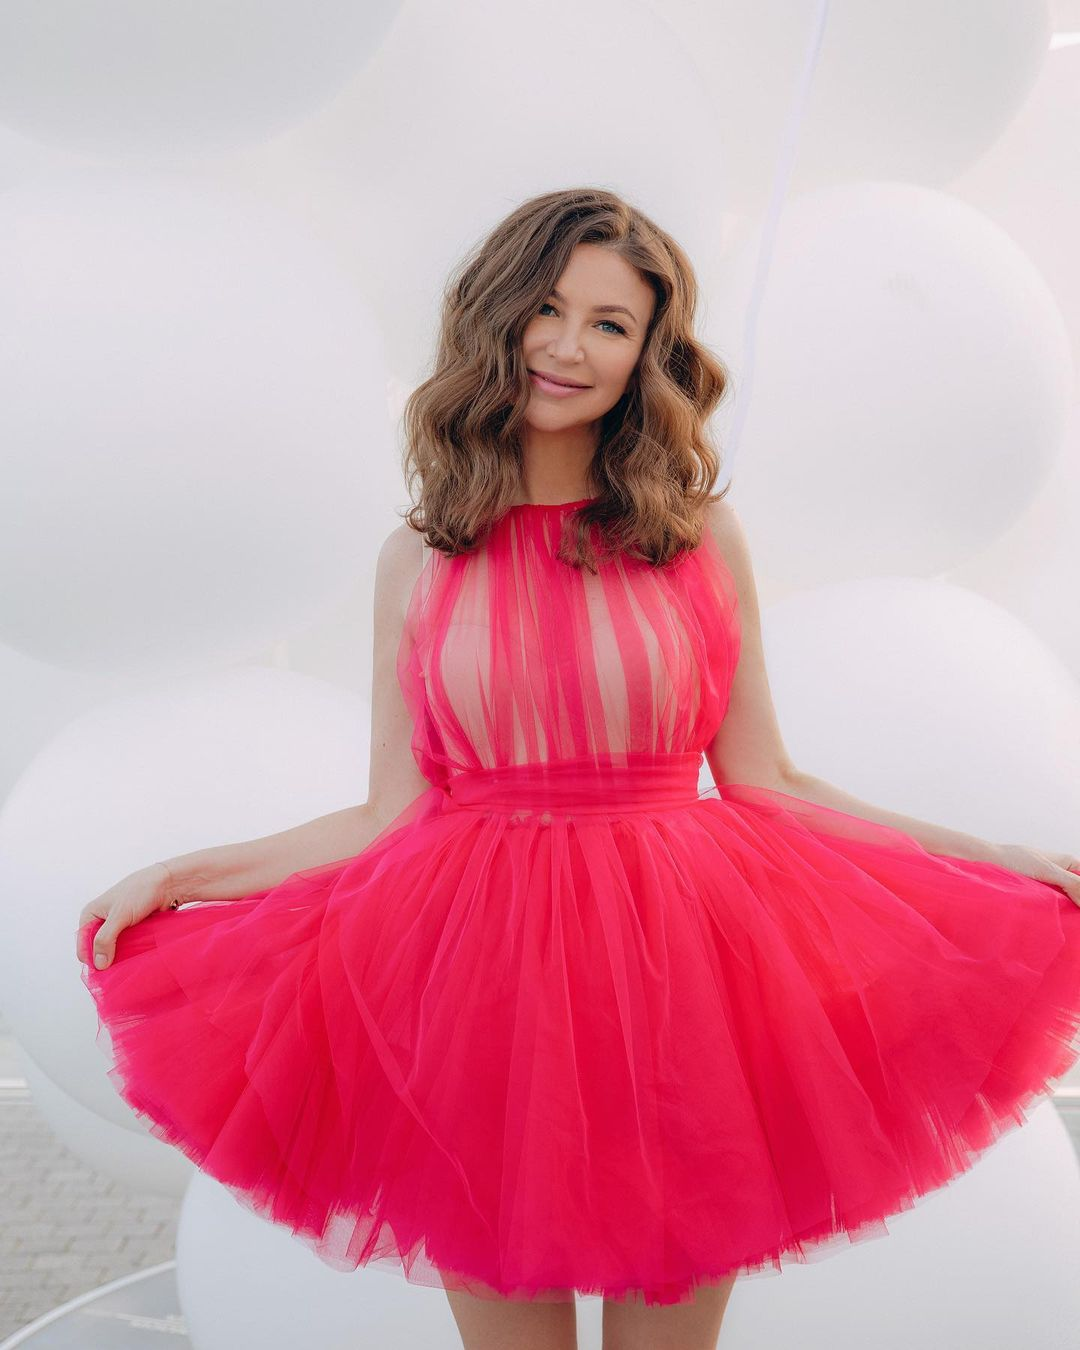 Elena Blinovskaya did not have enough money for Jennifer Lopez